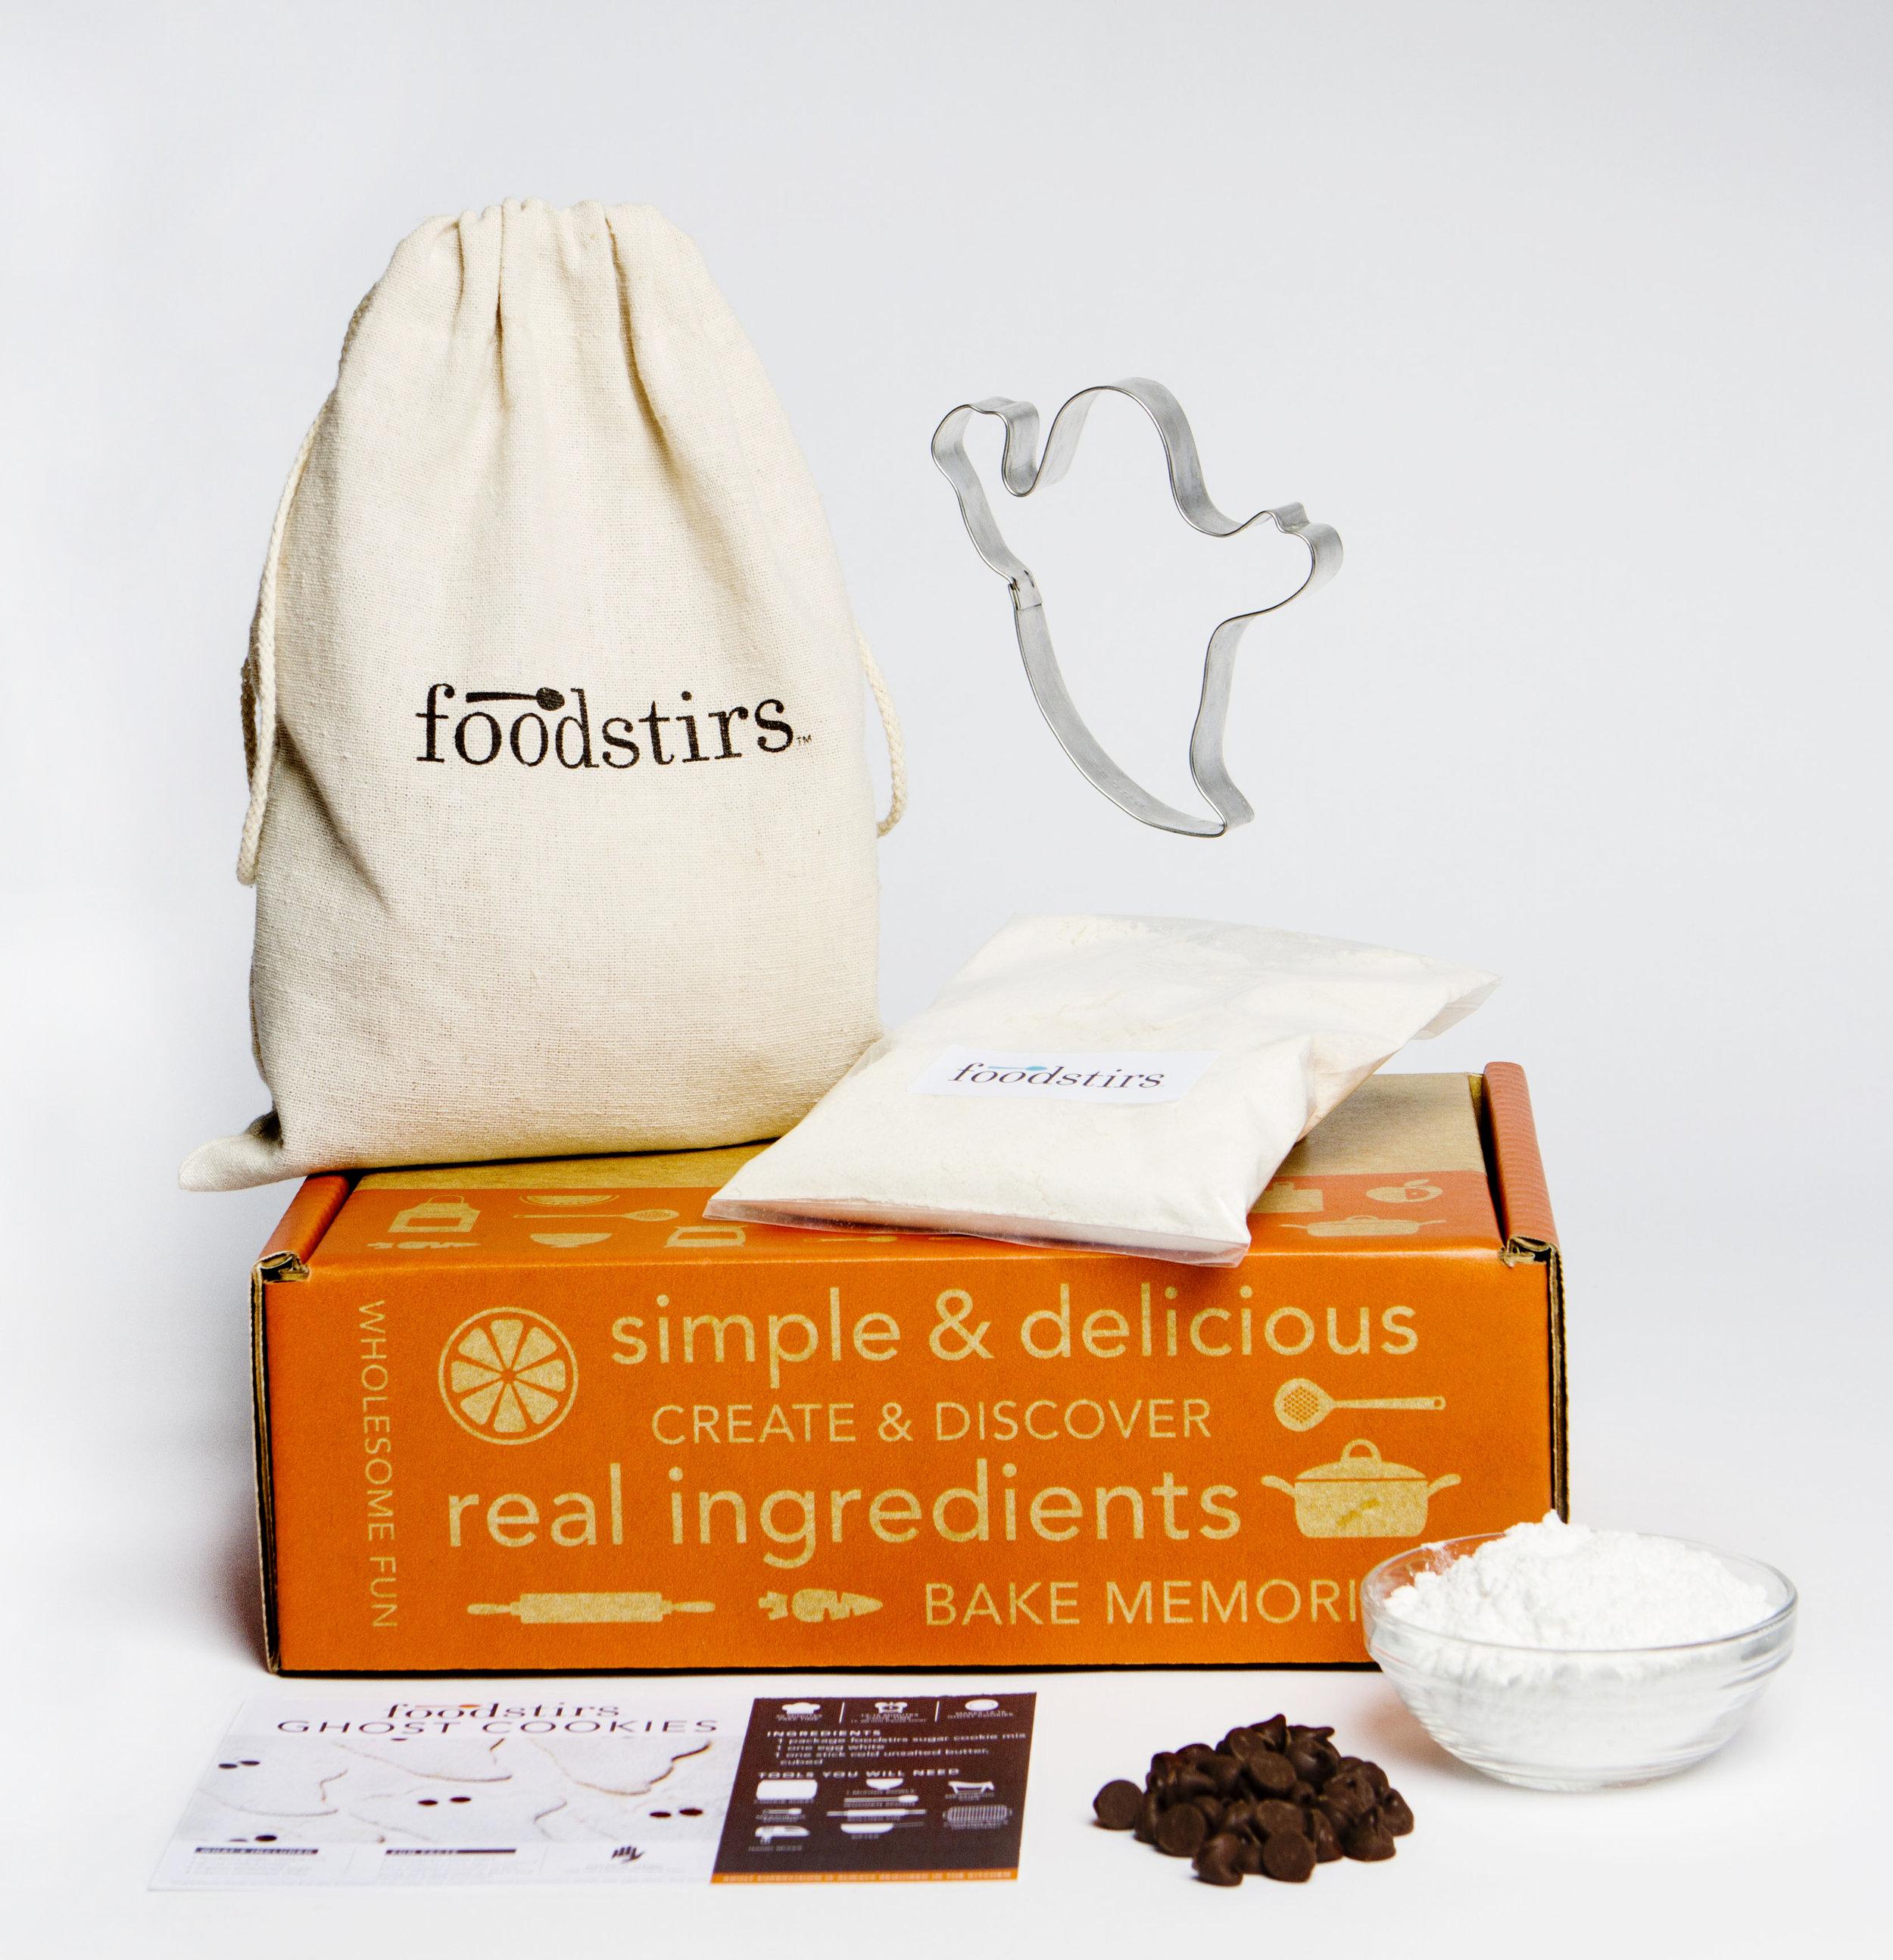 Retouch_Foodstirs_mg_4895.jpg